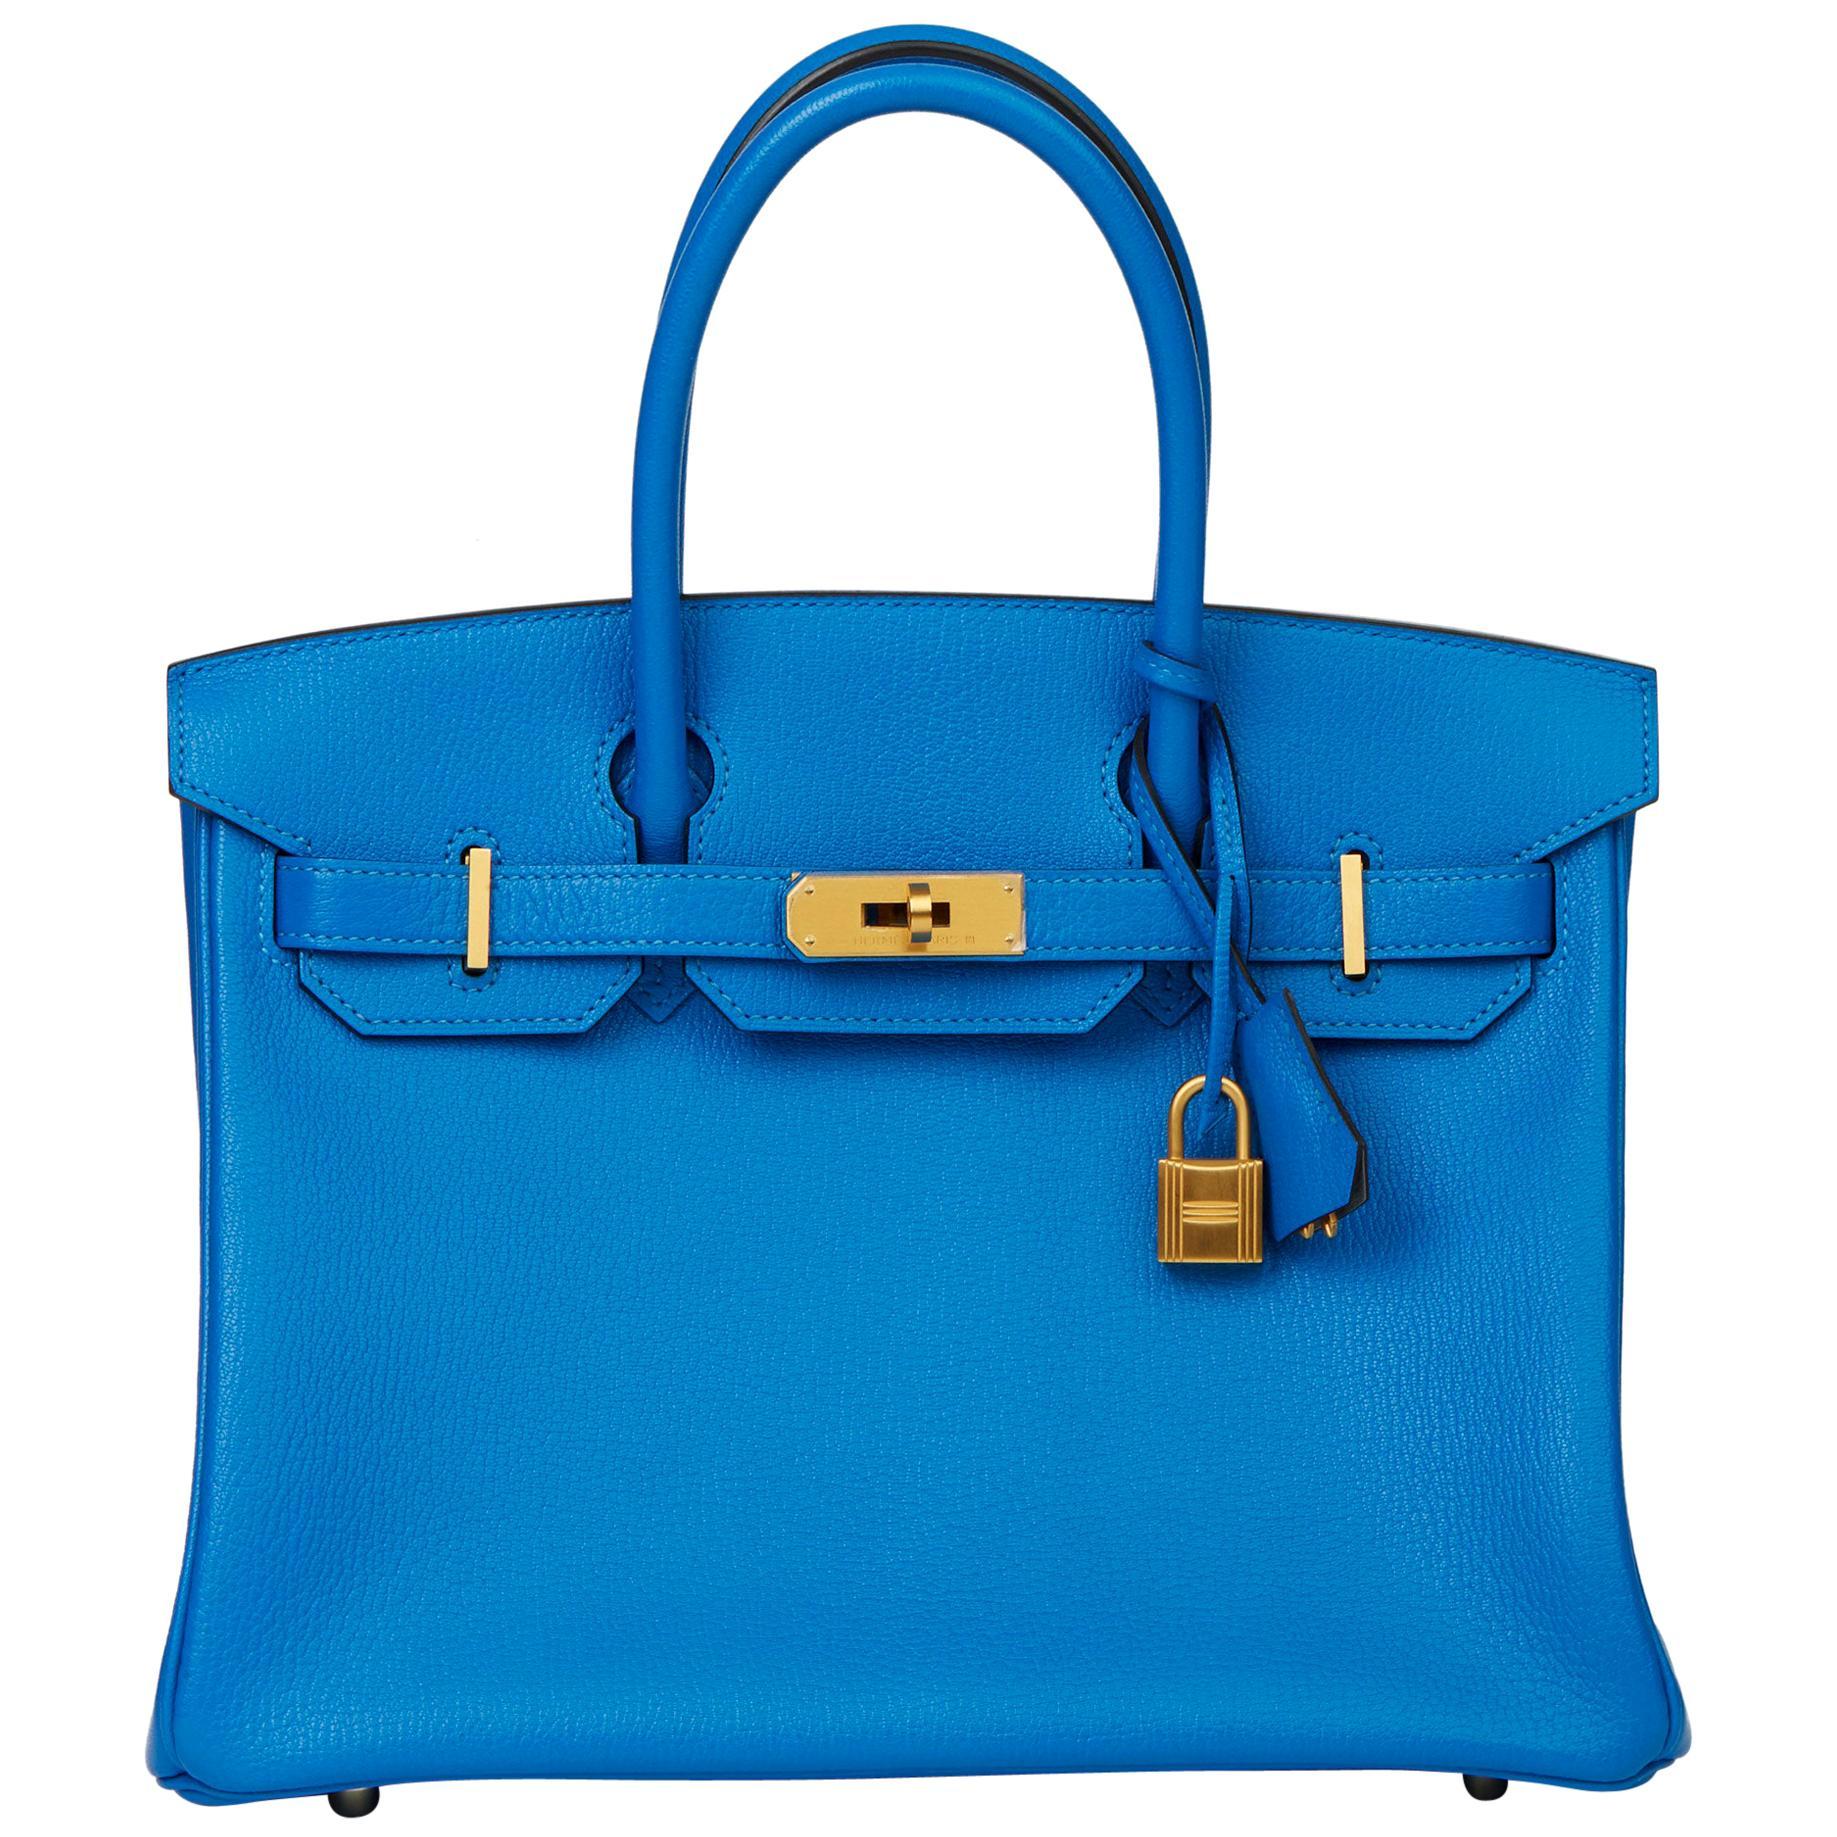 2017 Hermès Blue Hydra & Gris Mouette Chevre Mysore Special Order HSS Birkin 30